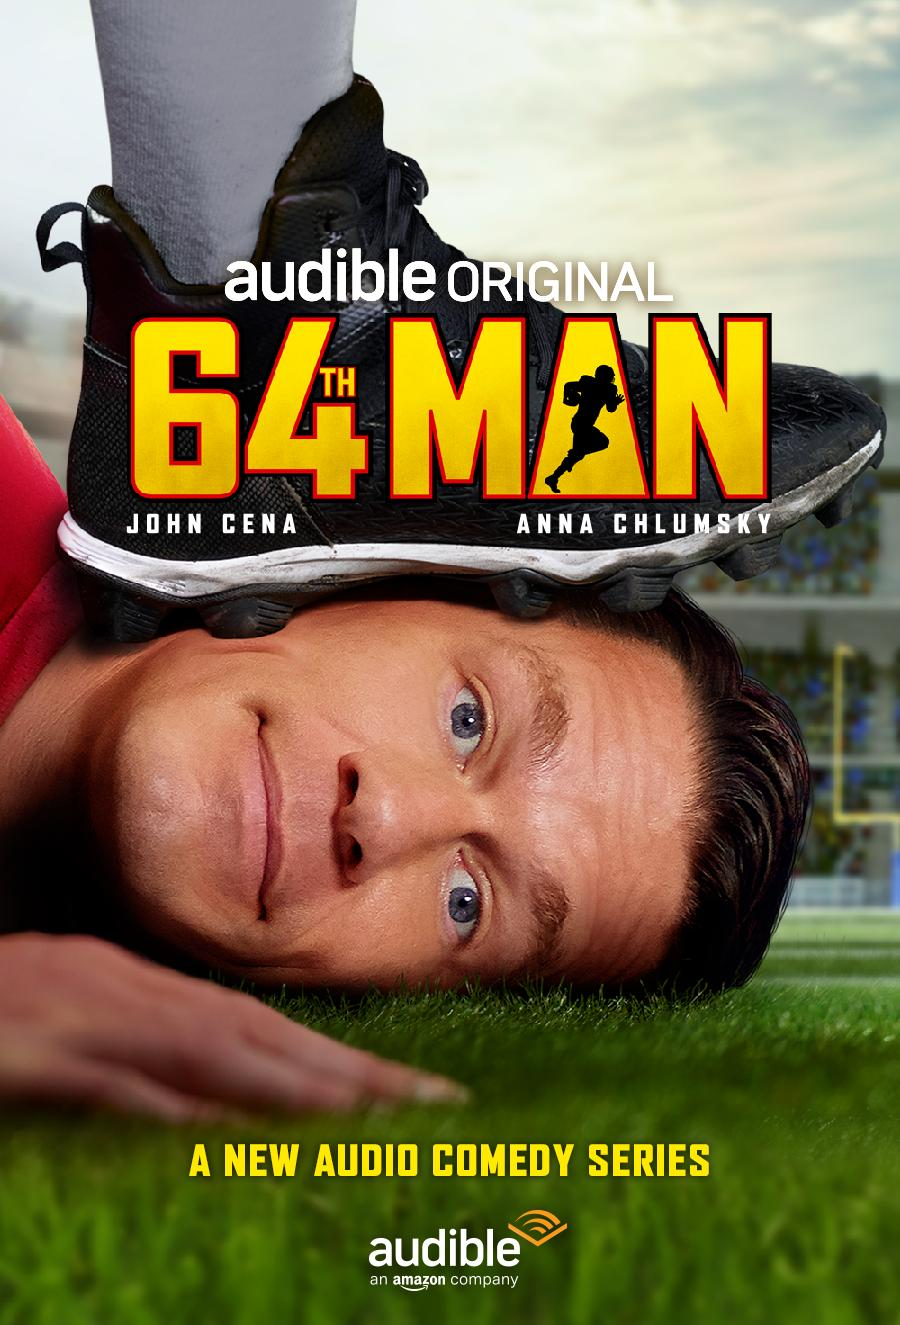 64th Man